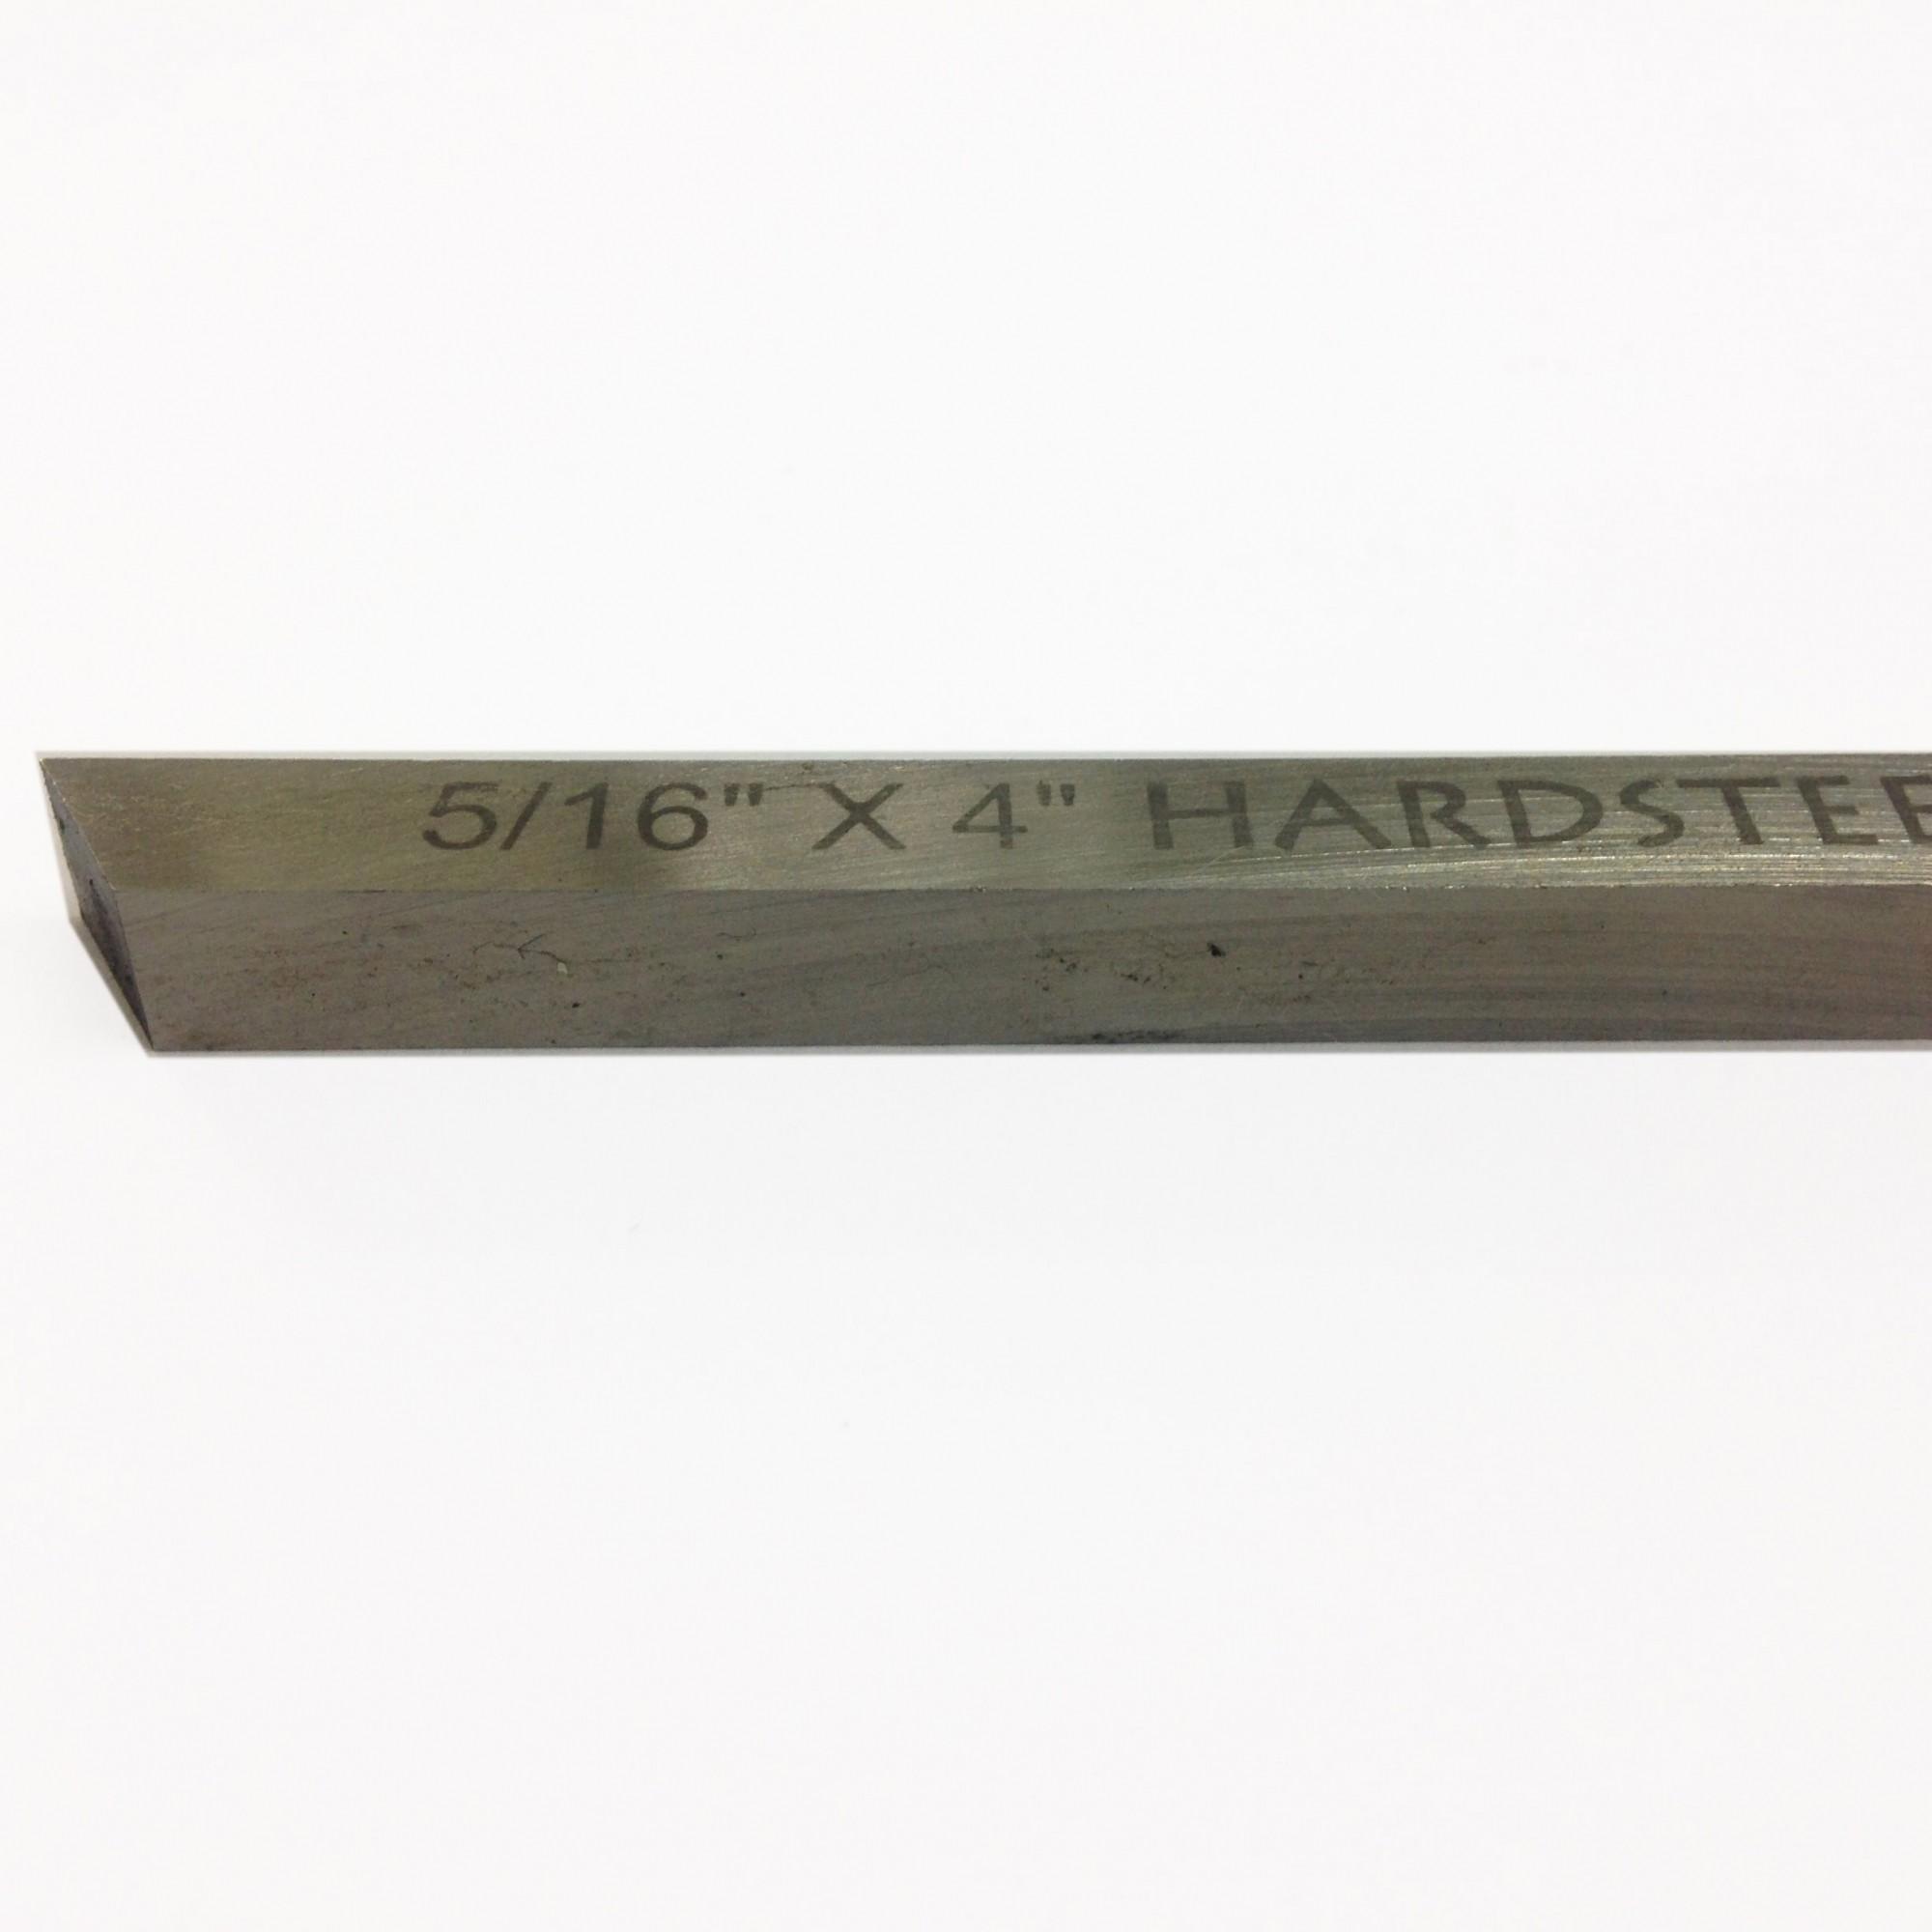 Bits Quadrado 5/16 x 4'' 50% Hardsteel